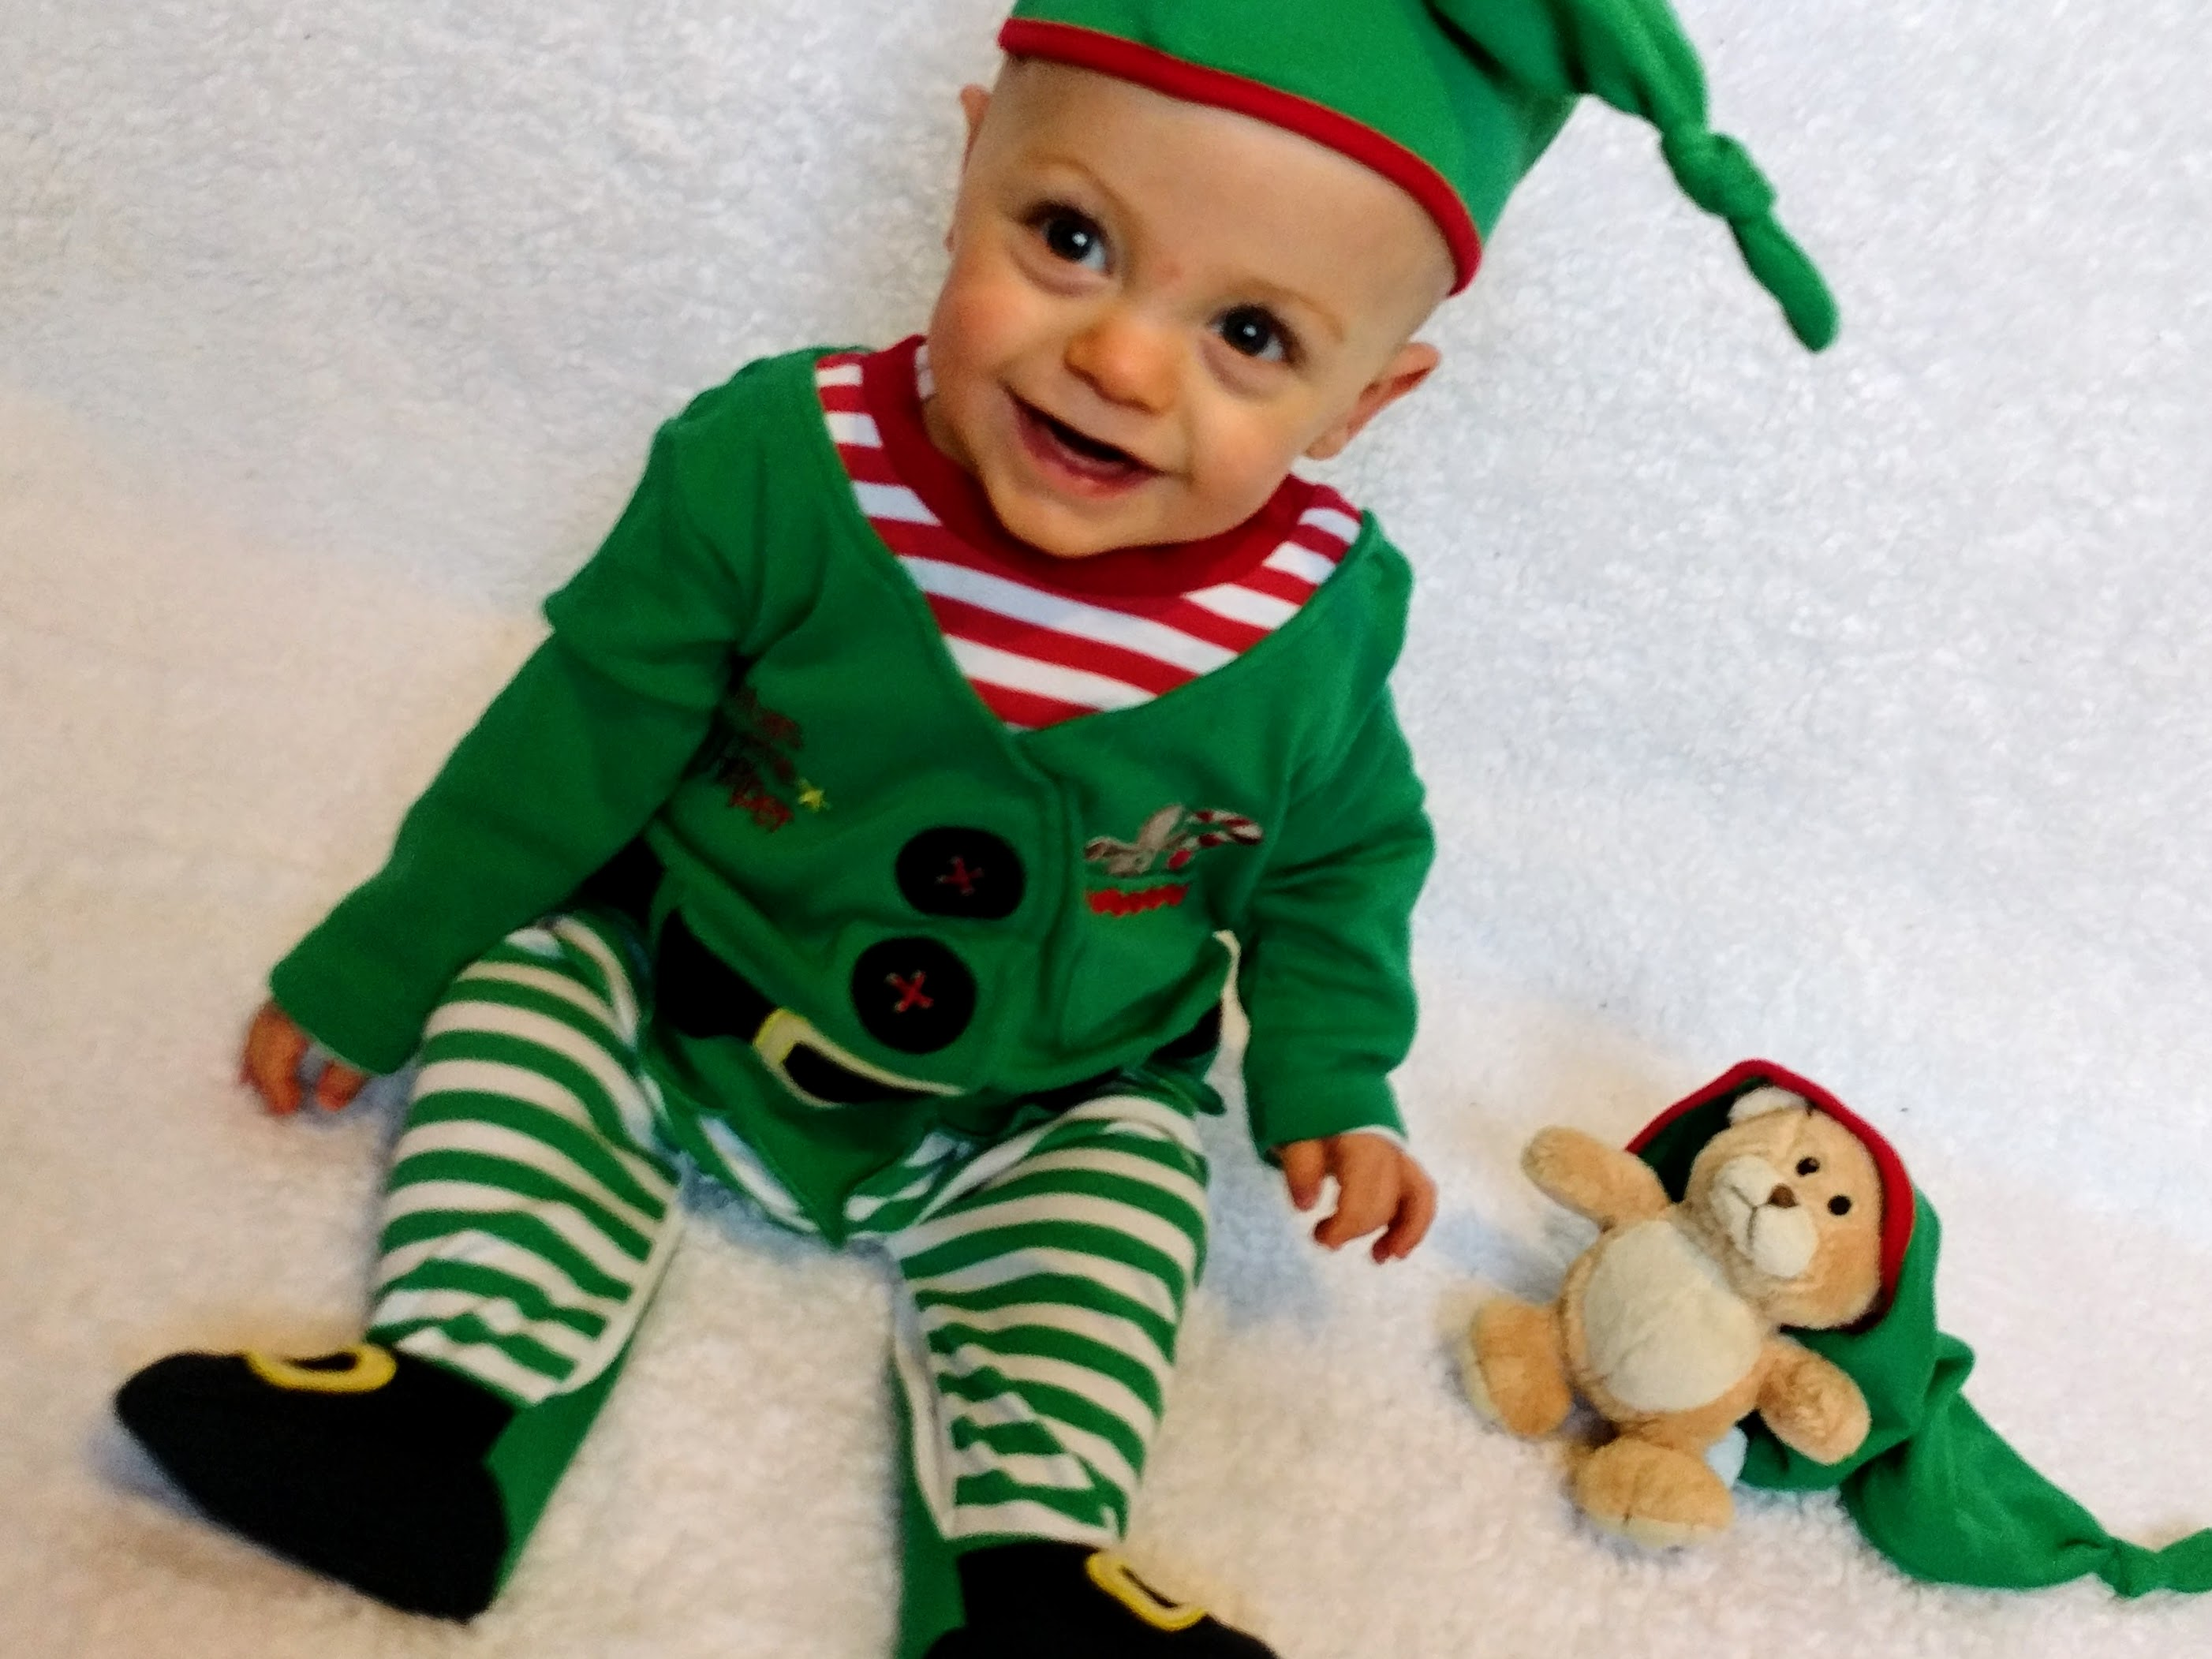 Henry the Elf